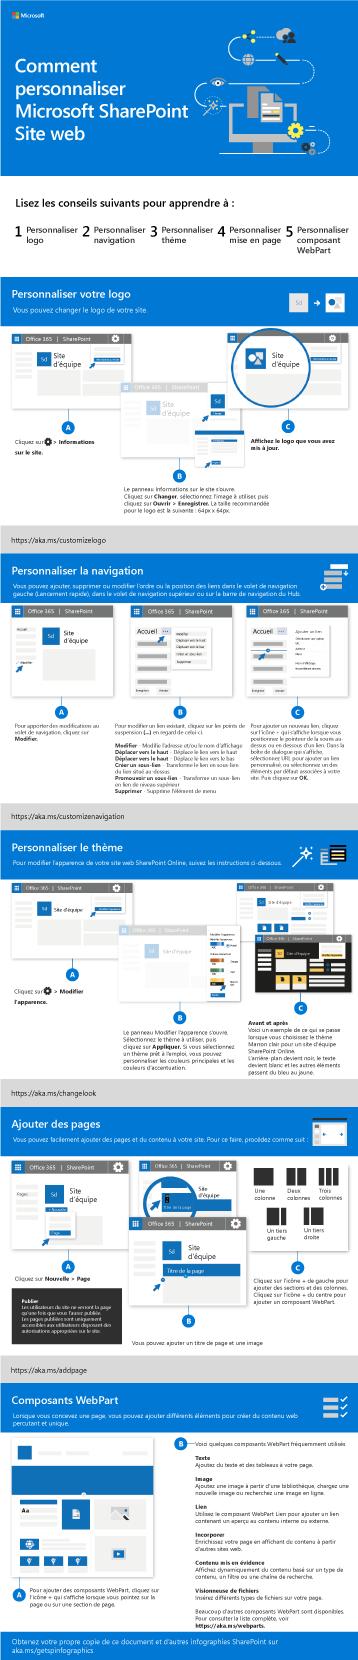 Personnaliser votre site SharePoint